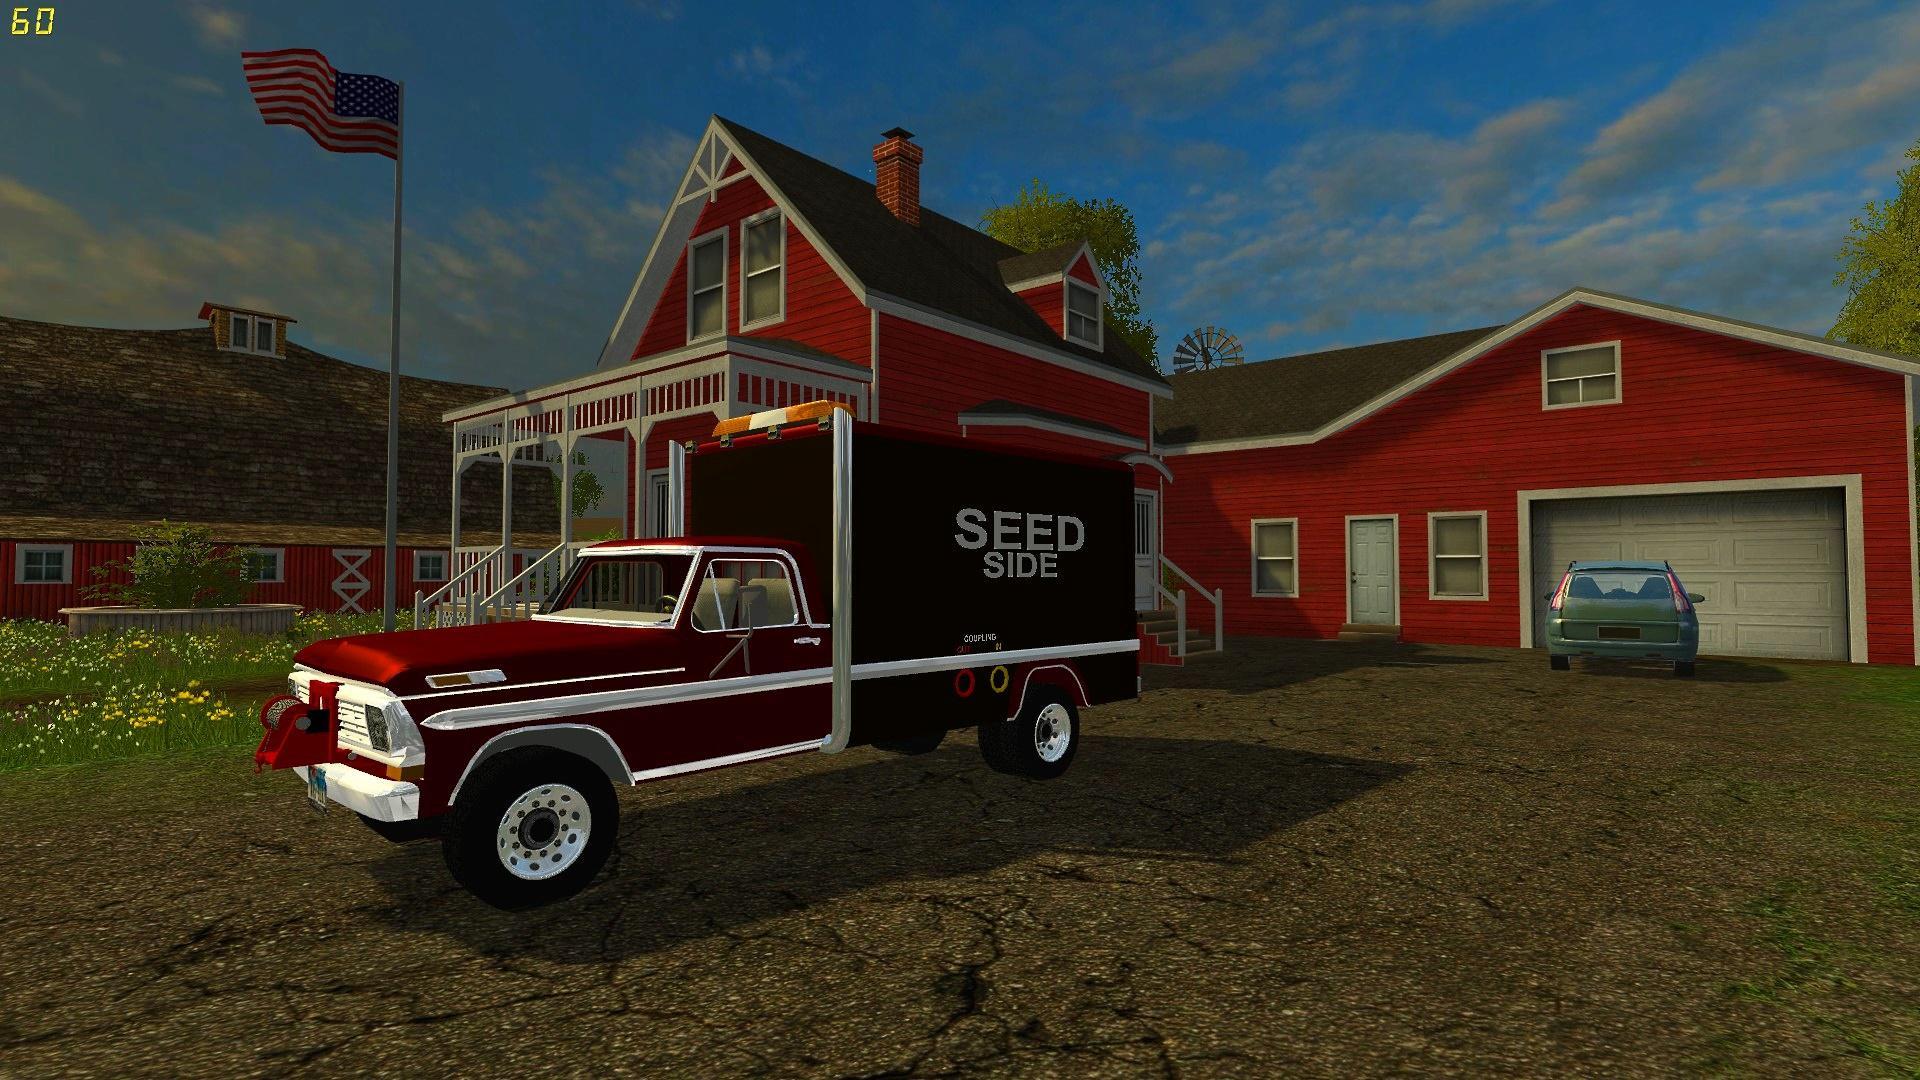 FS 15 Trucks - Farming simulator 19, 17, 15 mods | FS19, 17